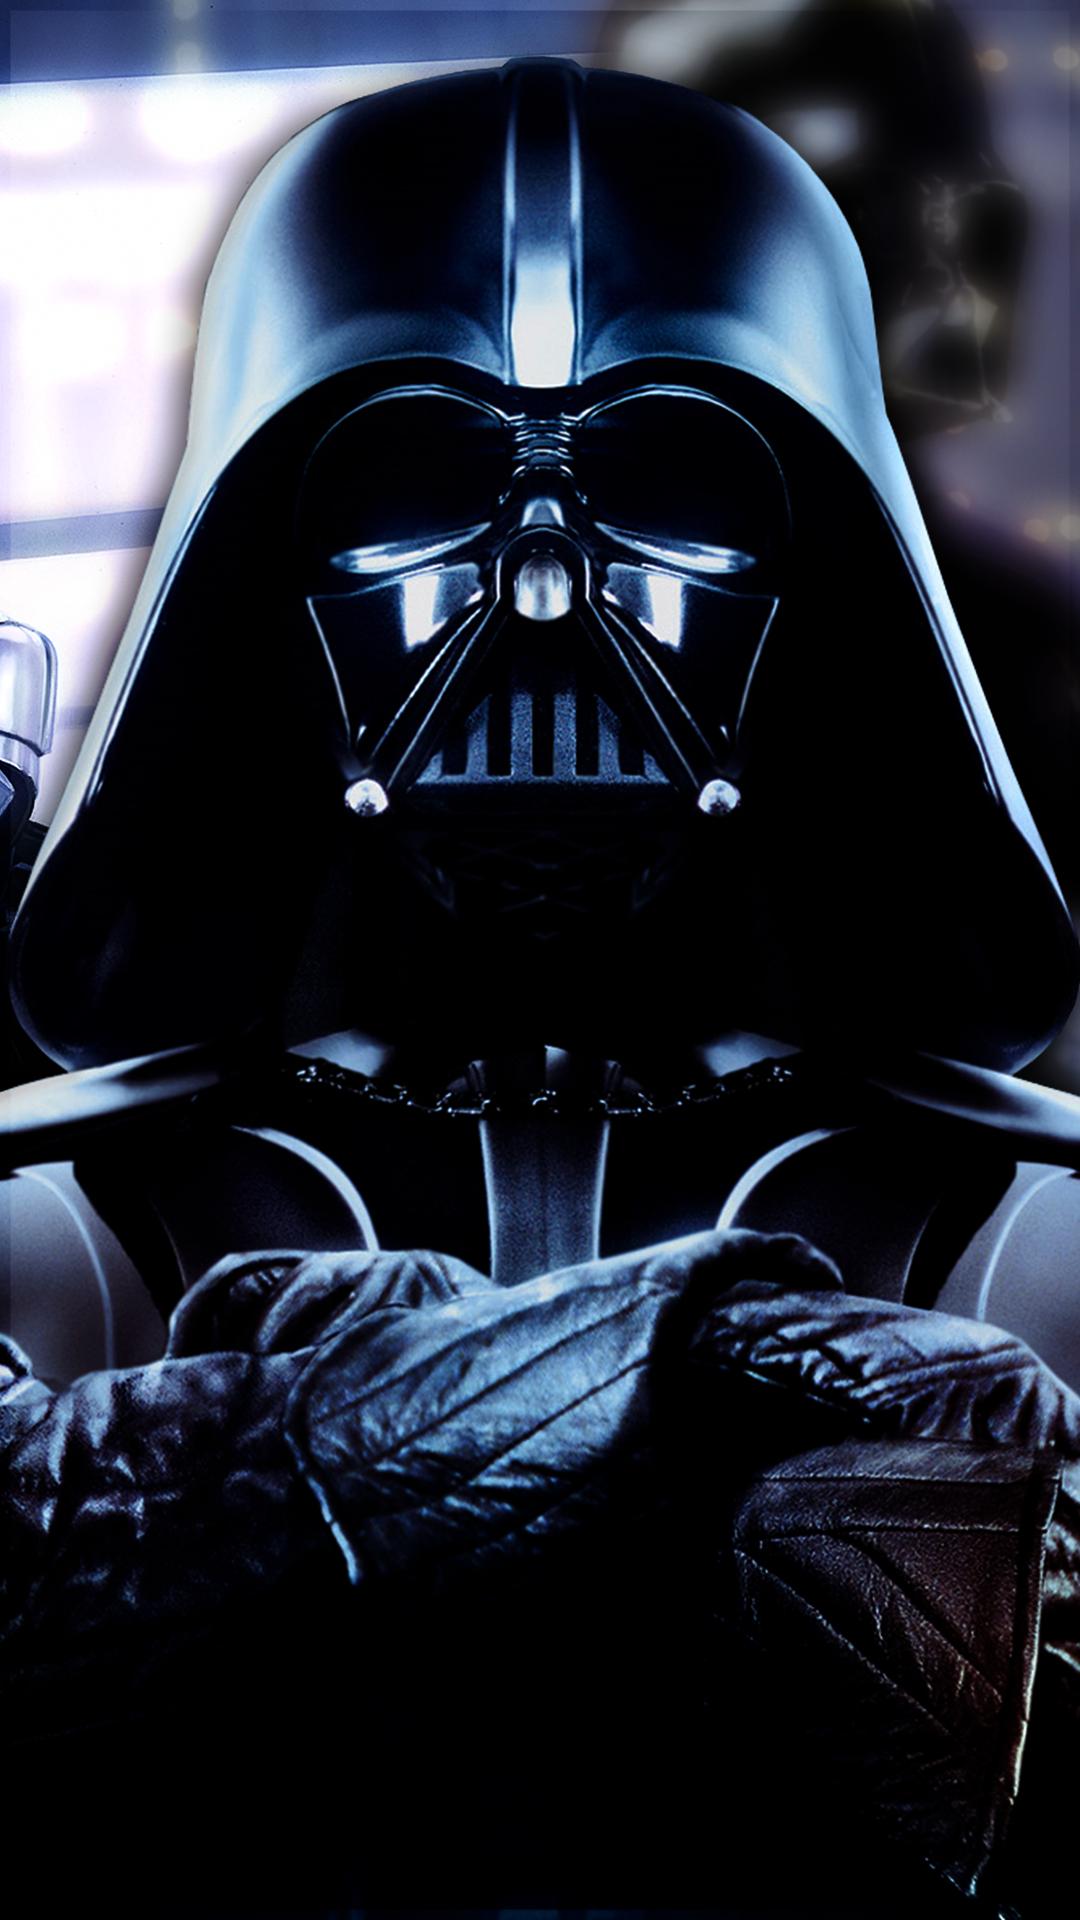 Darth Vader Star Wars Battlefront Wallpaper Iphone in 2020